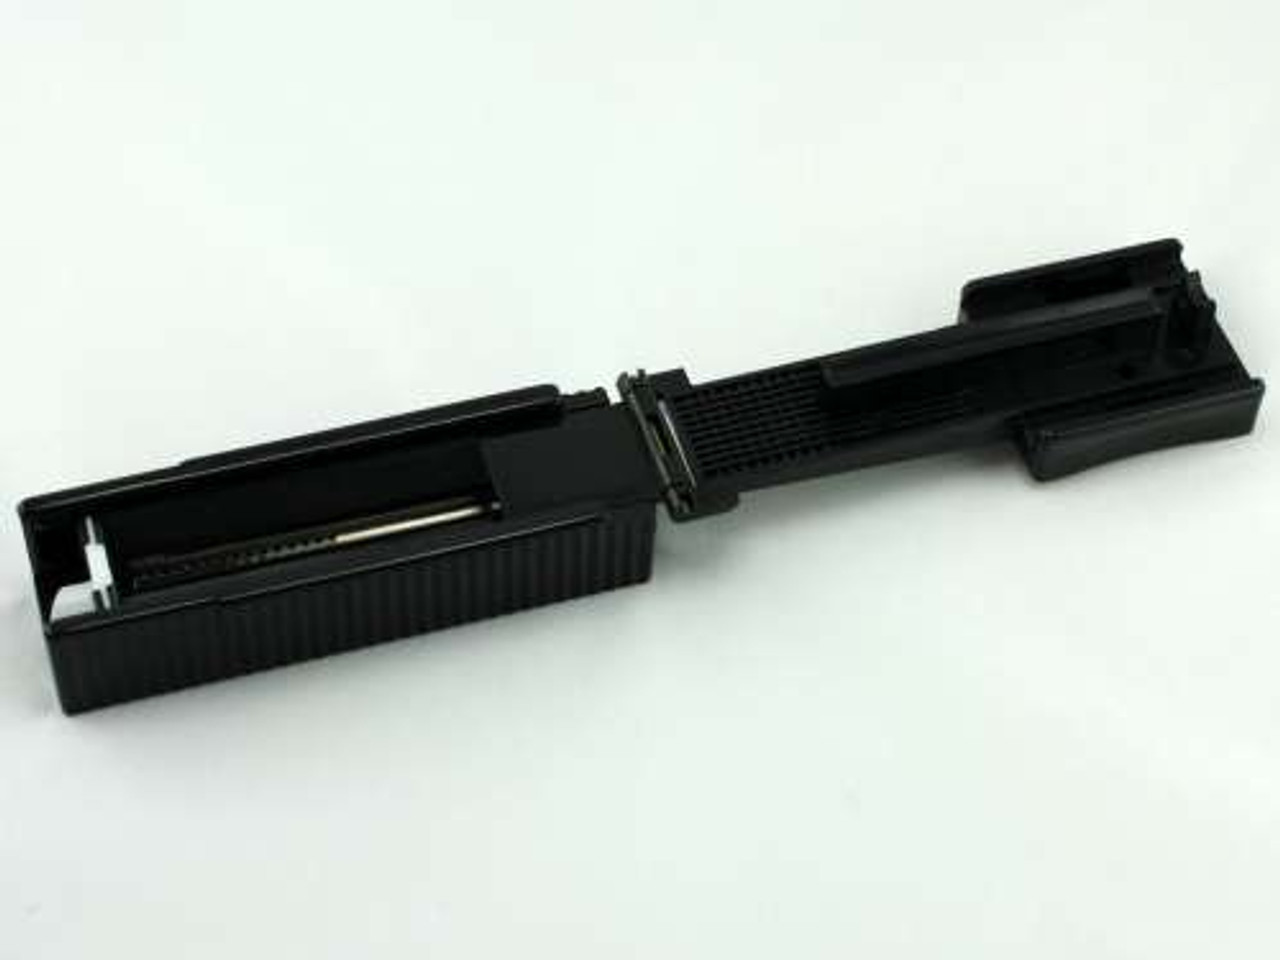 Zen King Size Cigarette Injector Machine